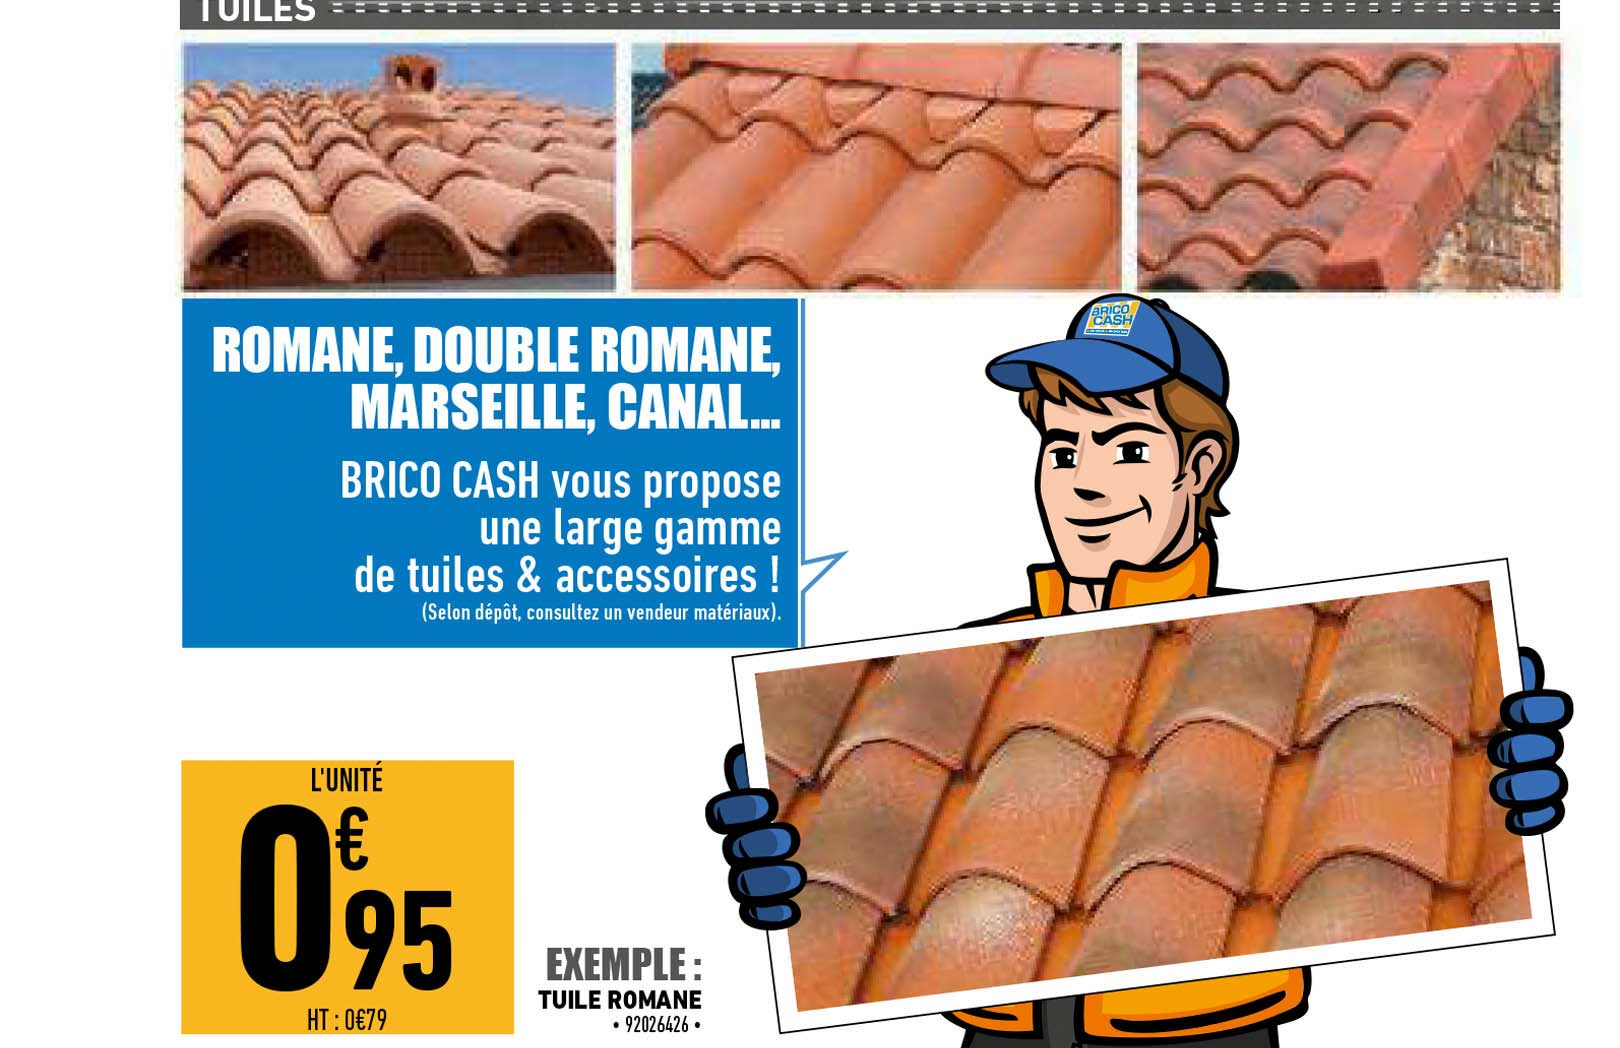 Offre Tuile Romane Chez Brico Cash